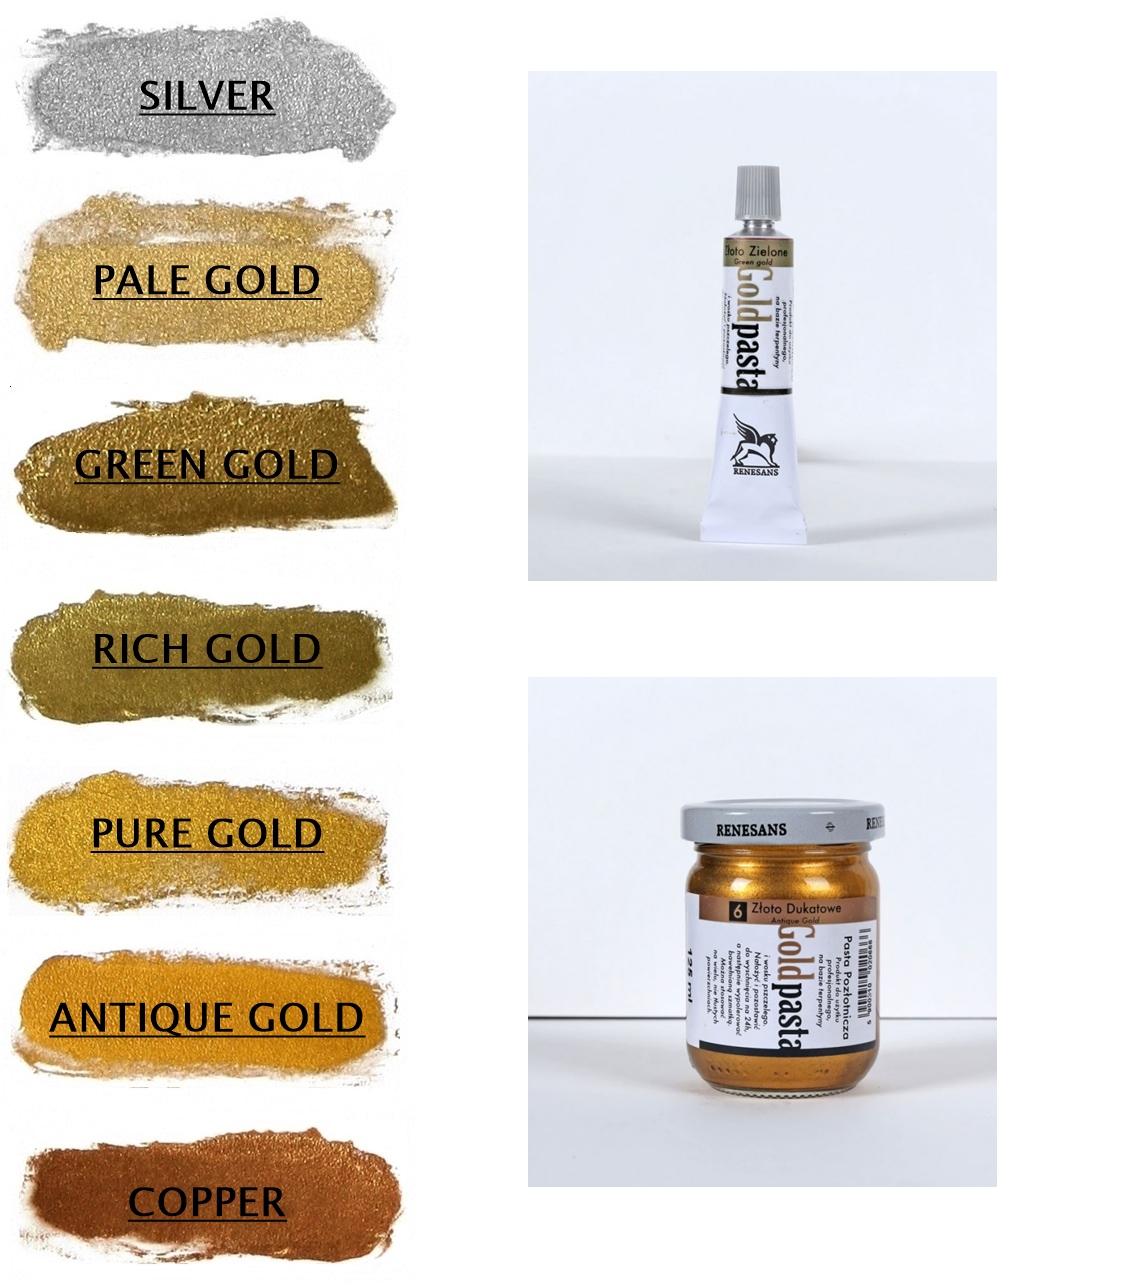 Billigermalen Renesans Goldpasta Goldpaste Goldfarbe